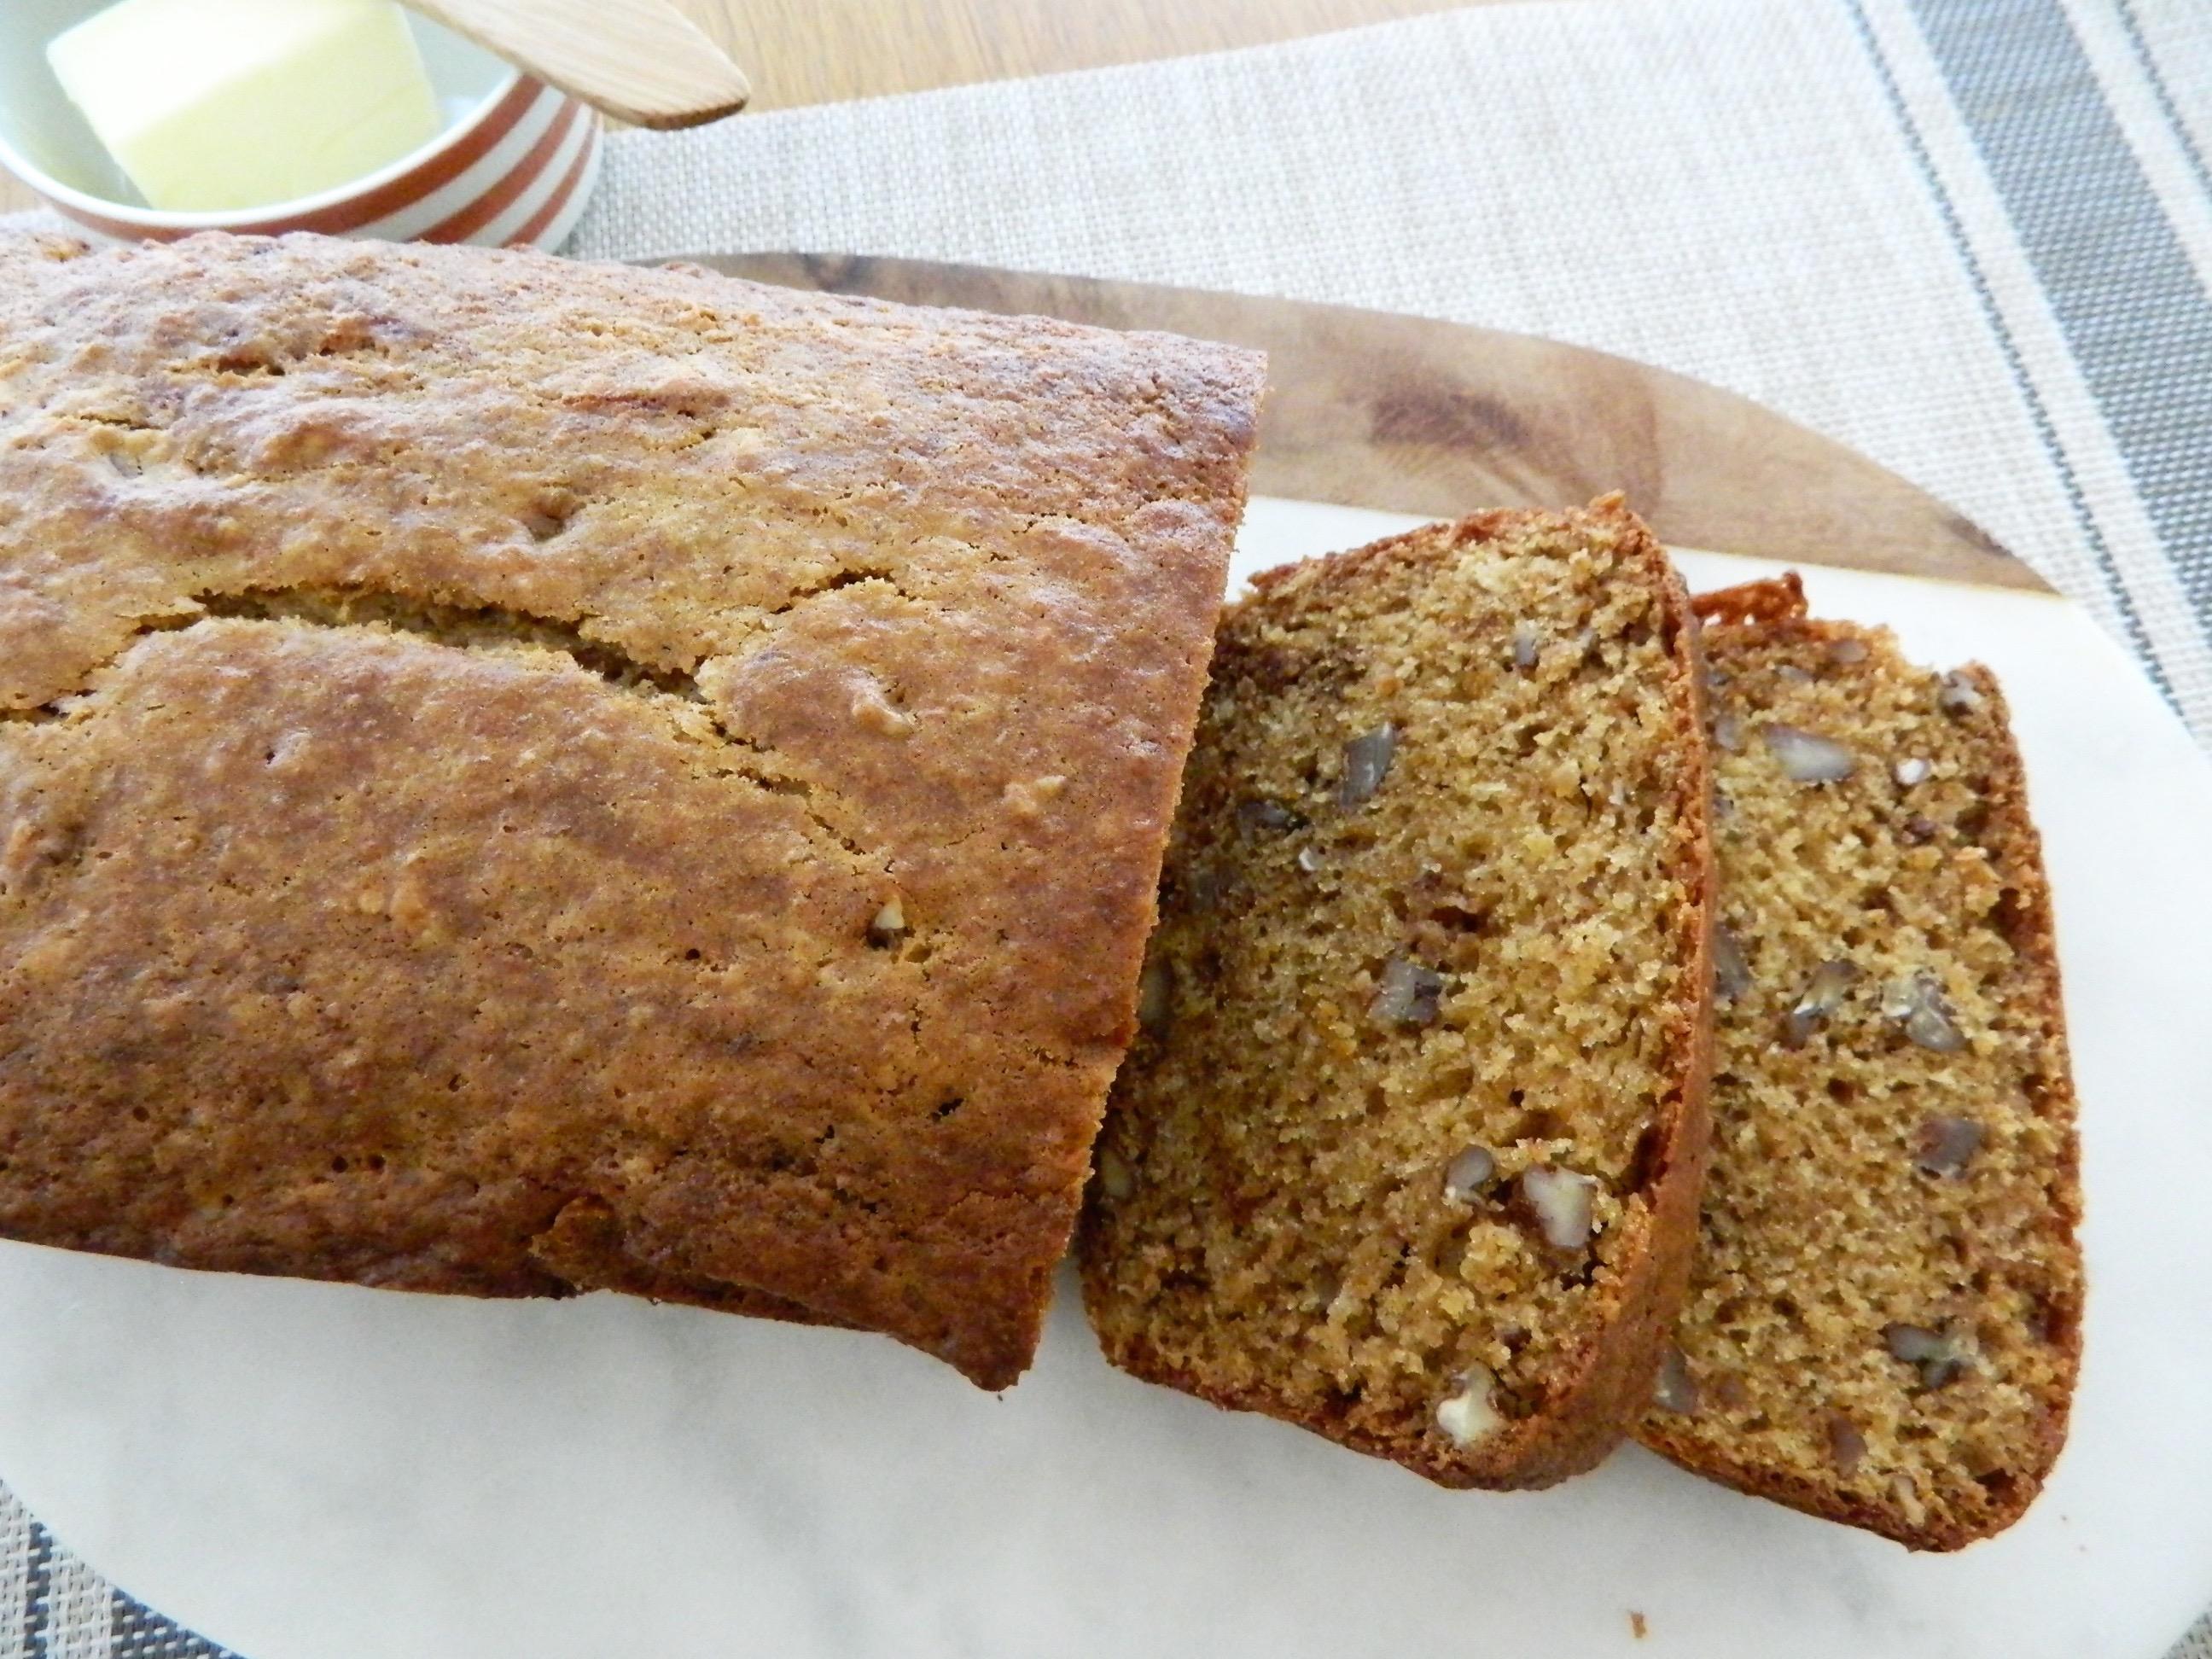 Persimmon Pecan Bread - finestofsuppers.com